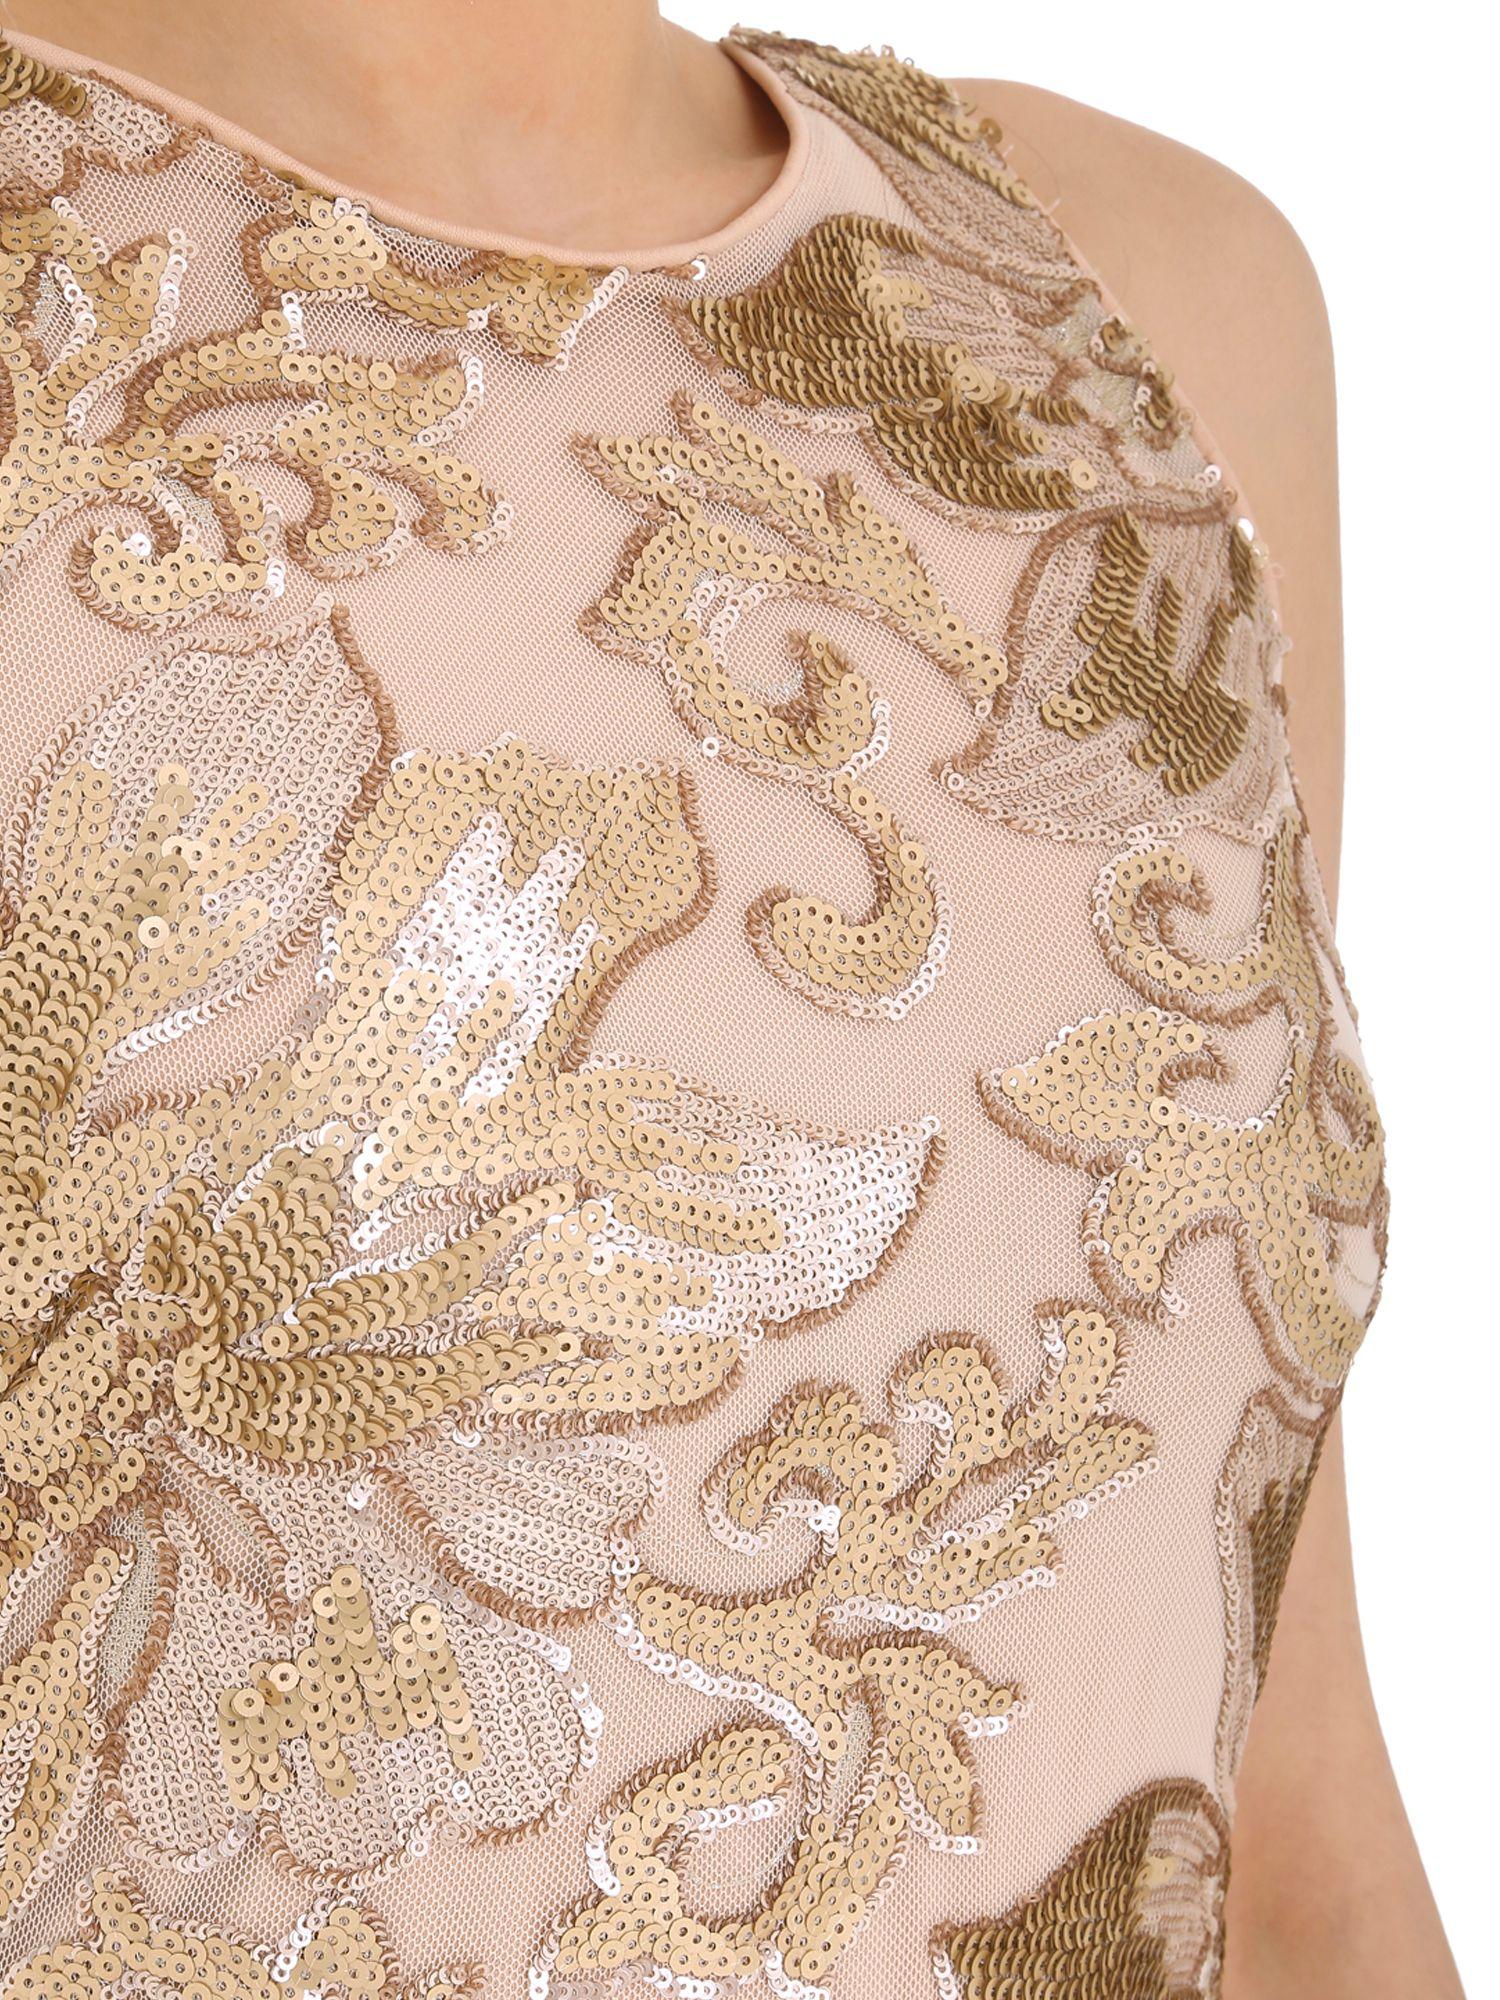 Lyst - Badgley Mischka Floral Sequin Gown in Pink